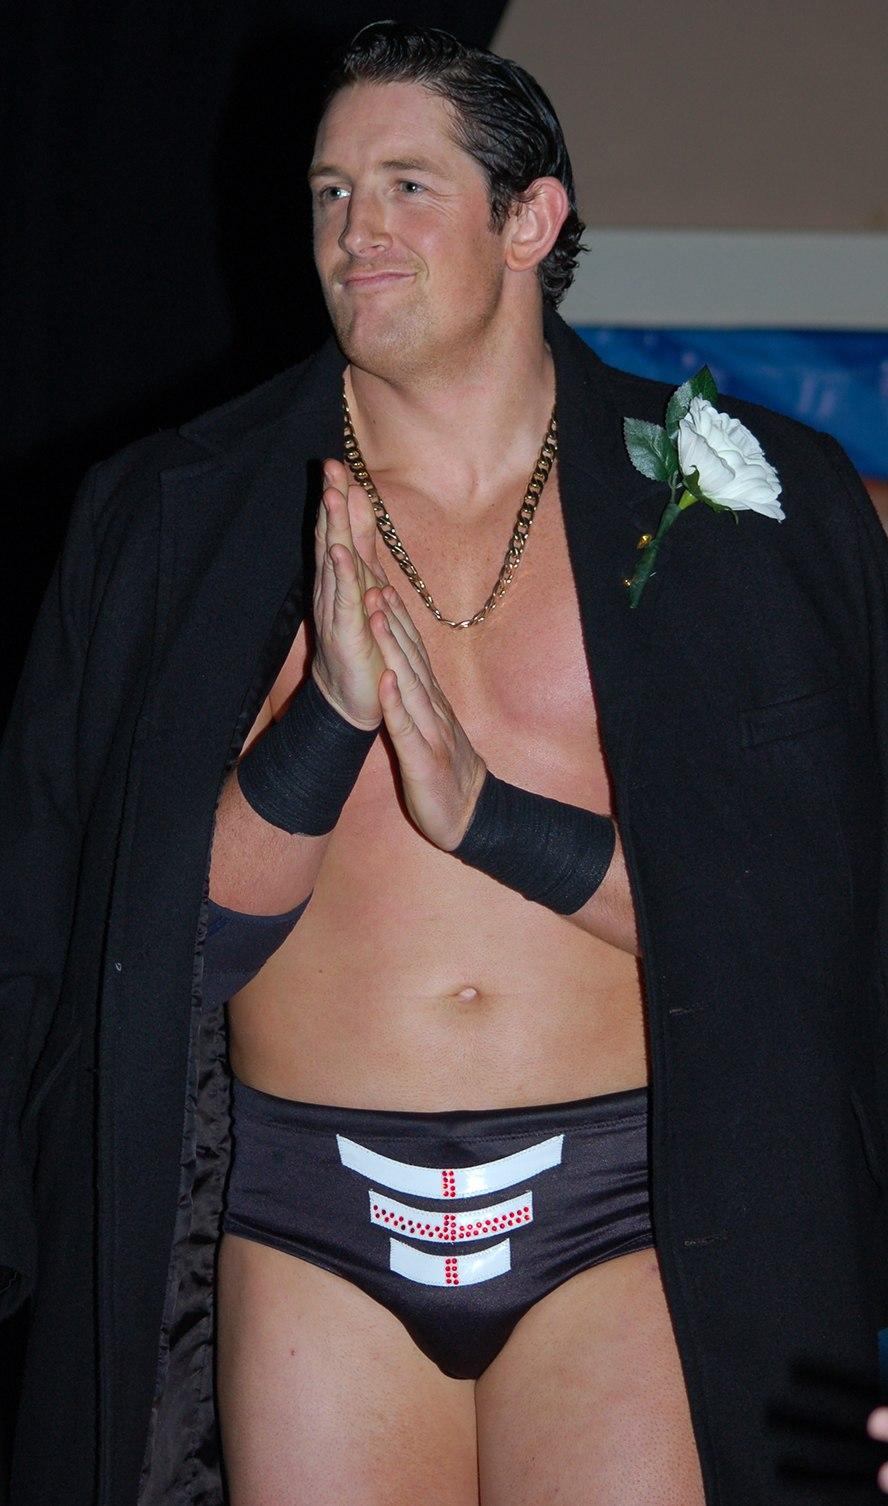 Wade Barrett, winner of season 1